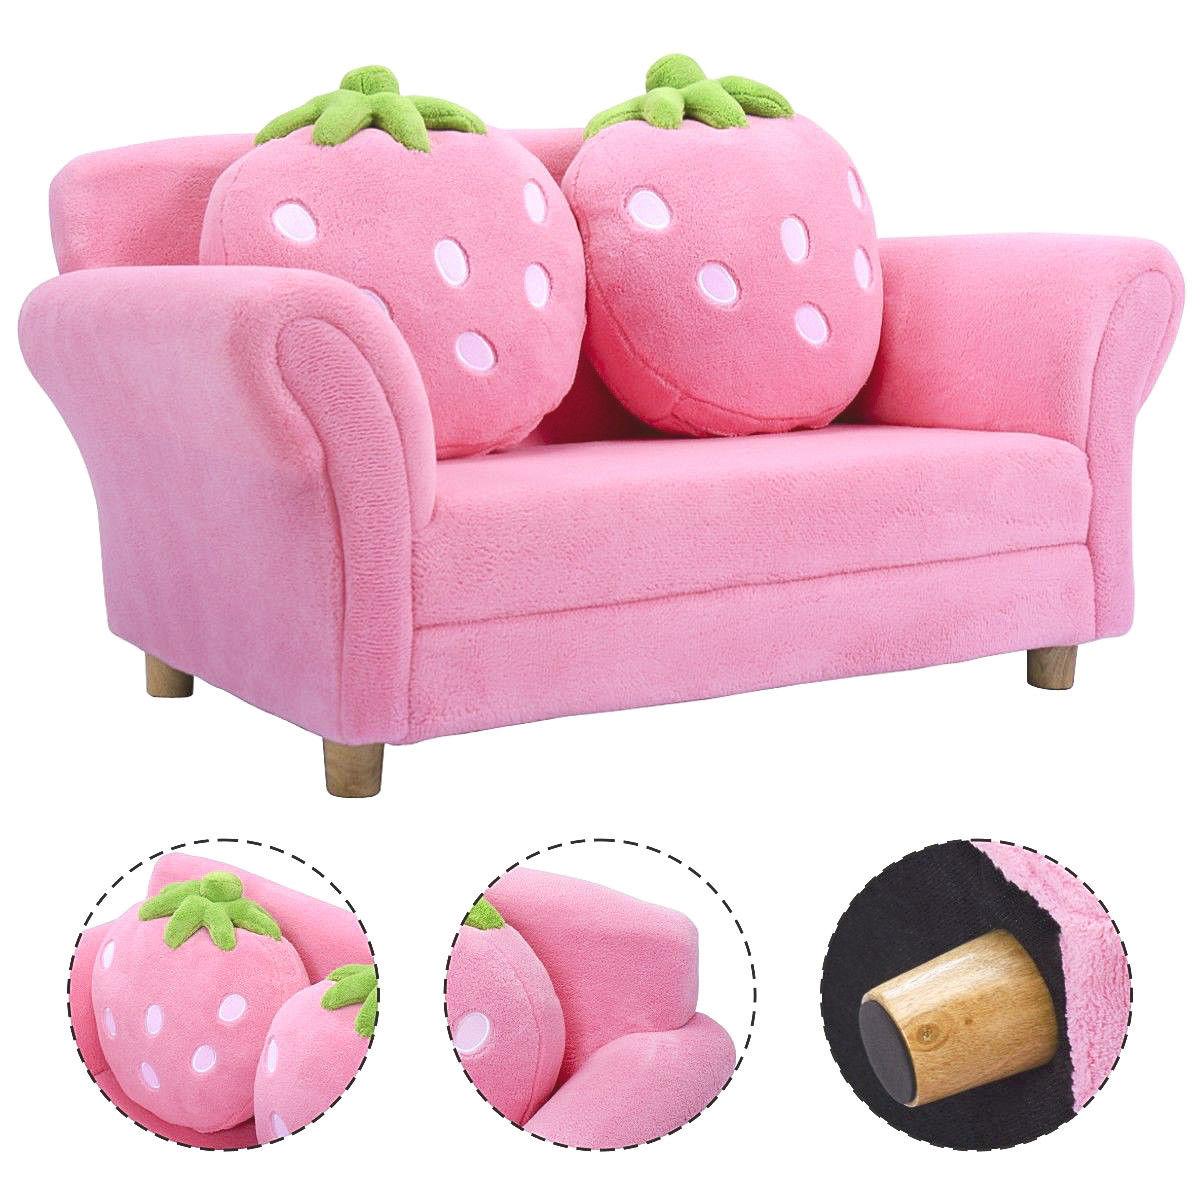 Costway الاطفال أريكة الفراولة مسند ذراع كرسي صالة الأريكة w/2 وسادة الأطفال طفل الوردي